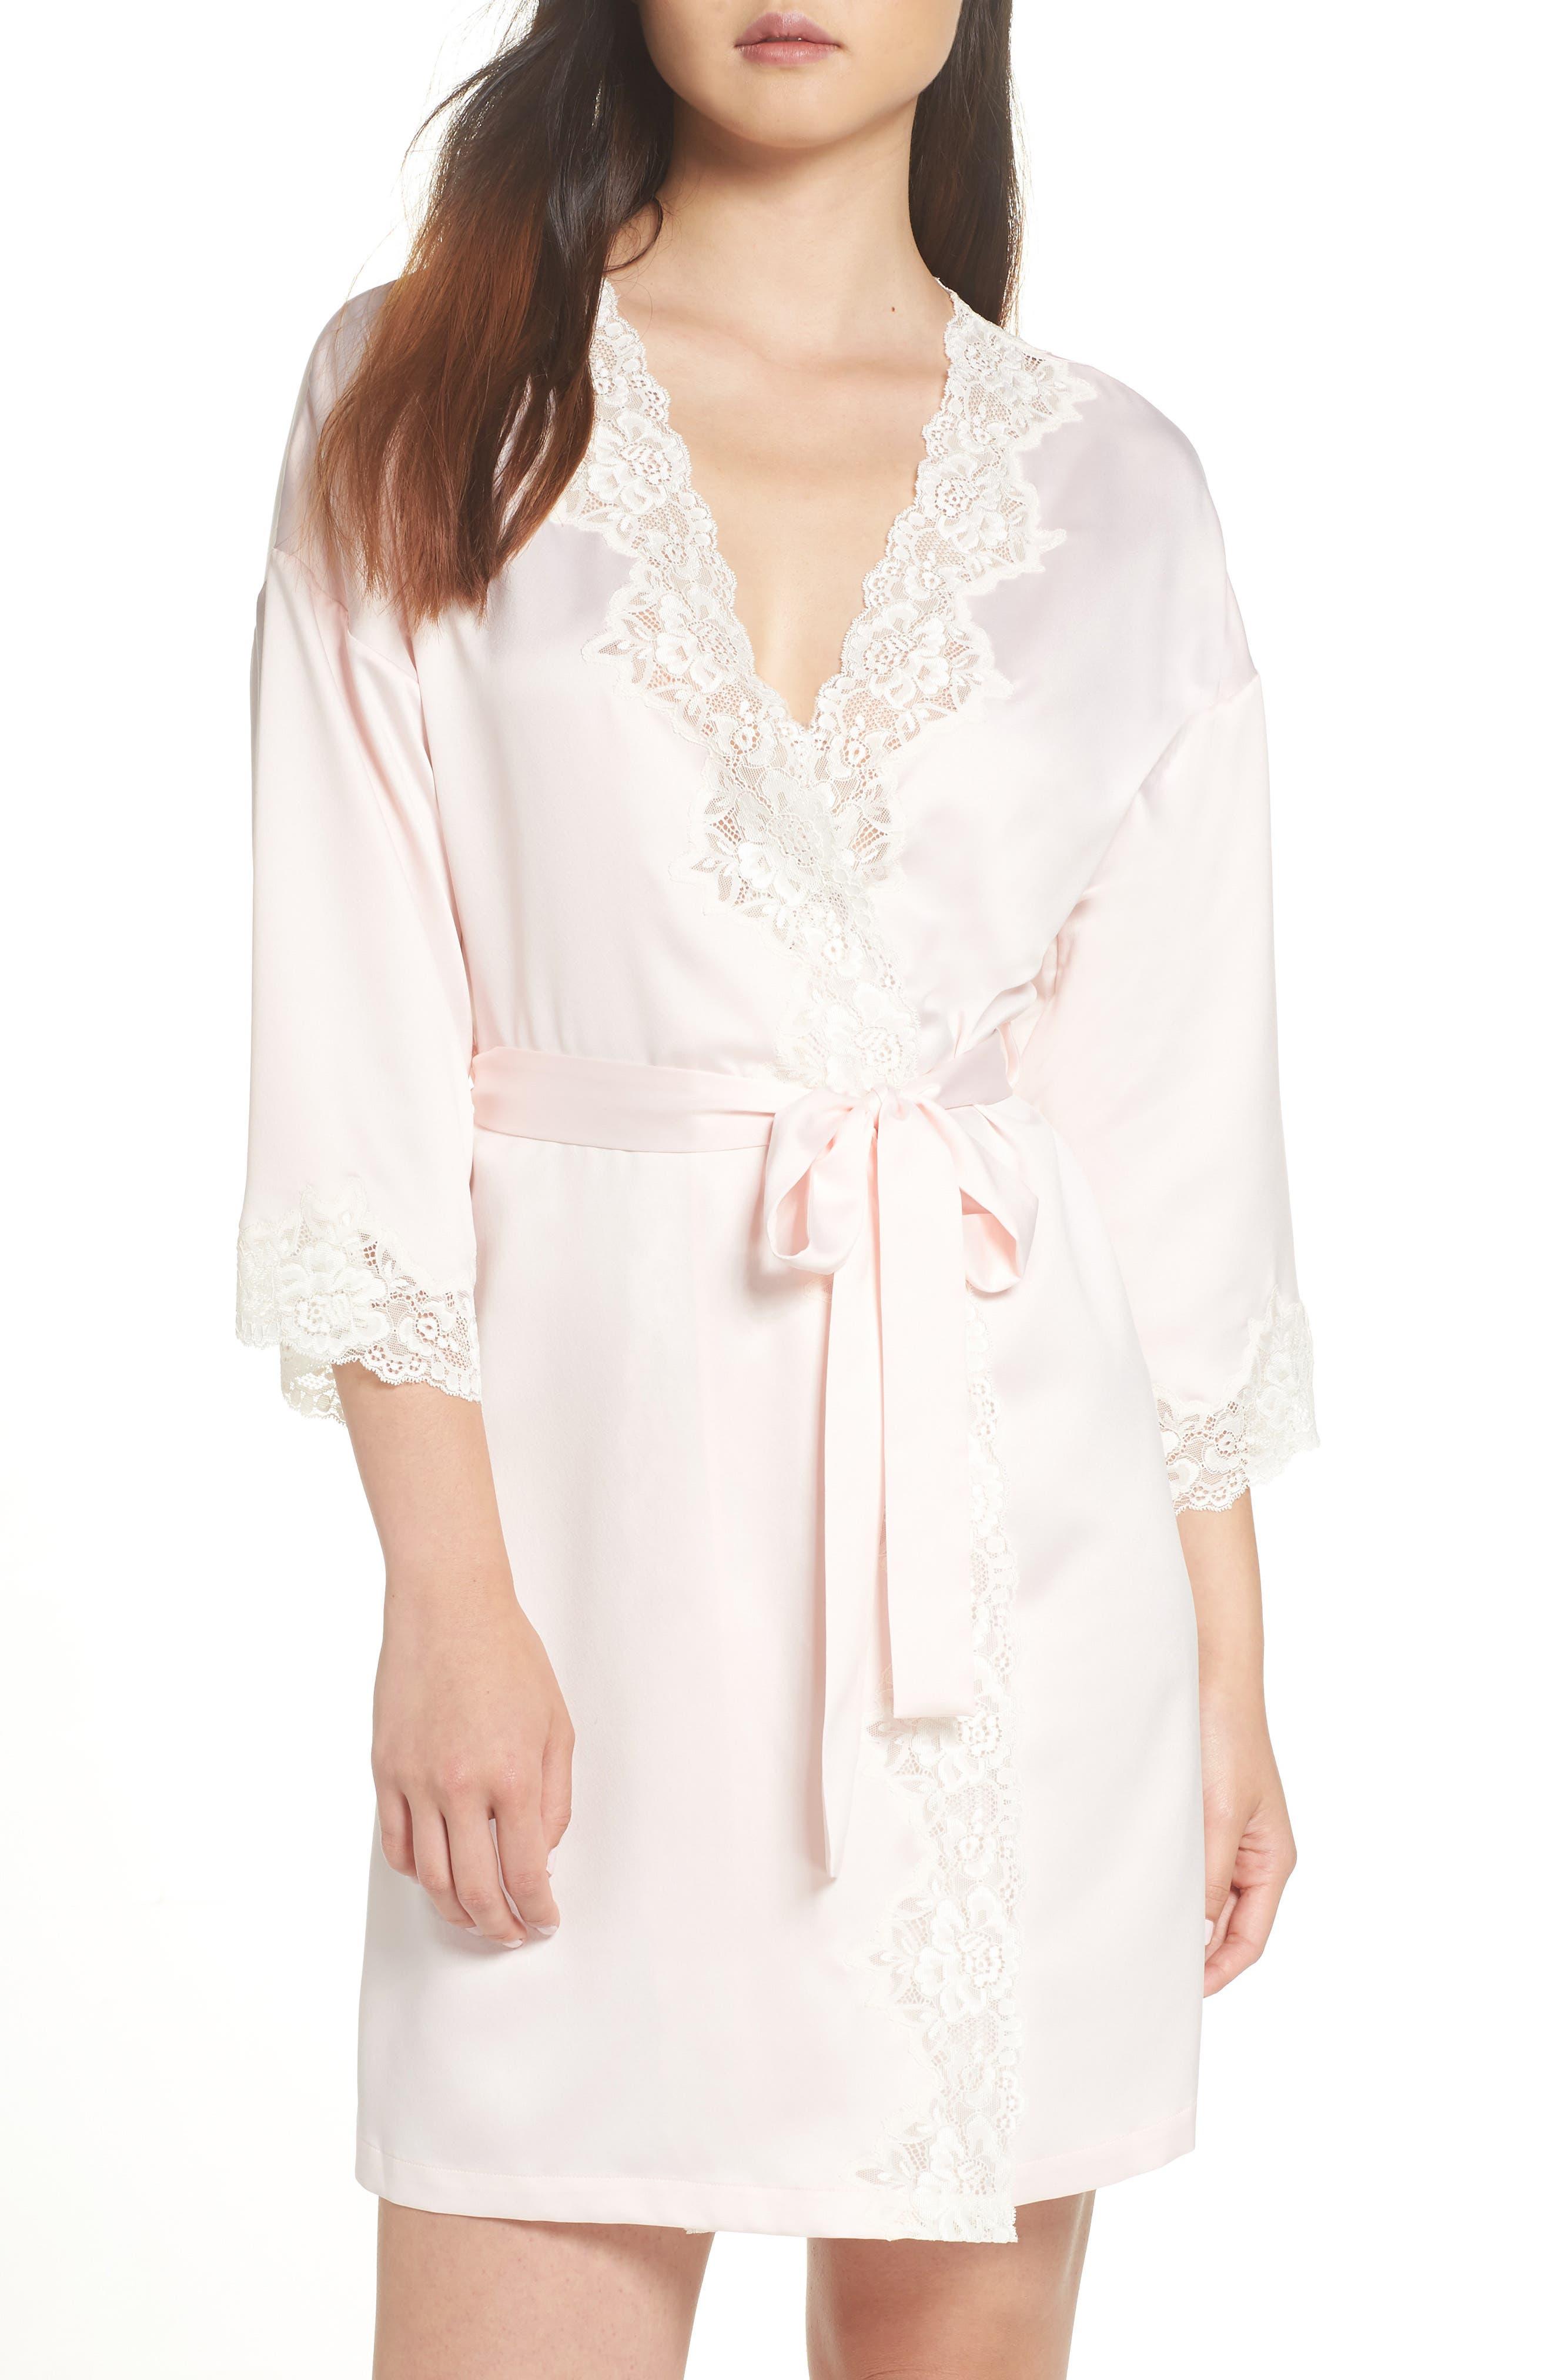 Vintage Nightgowns, Pajamas, Baby Dolls, Robes Womens Lauren Ralph Lauren Lace Trim Houndstooth Satin Robe Size Medium - Pink $80.00 AT vintagedancer.com